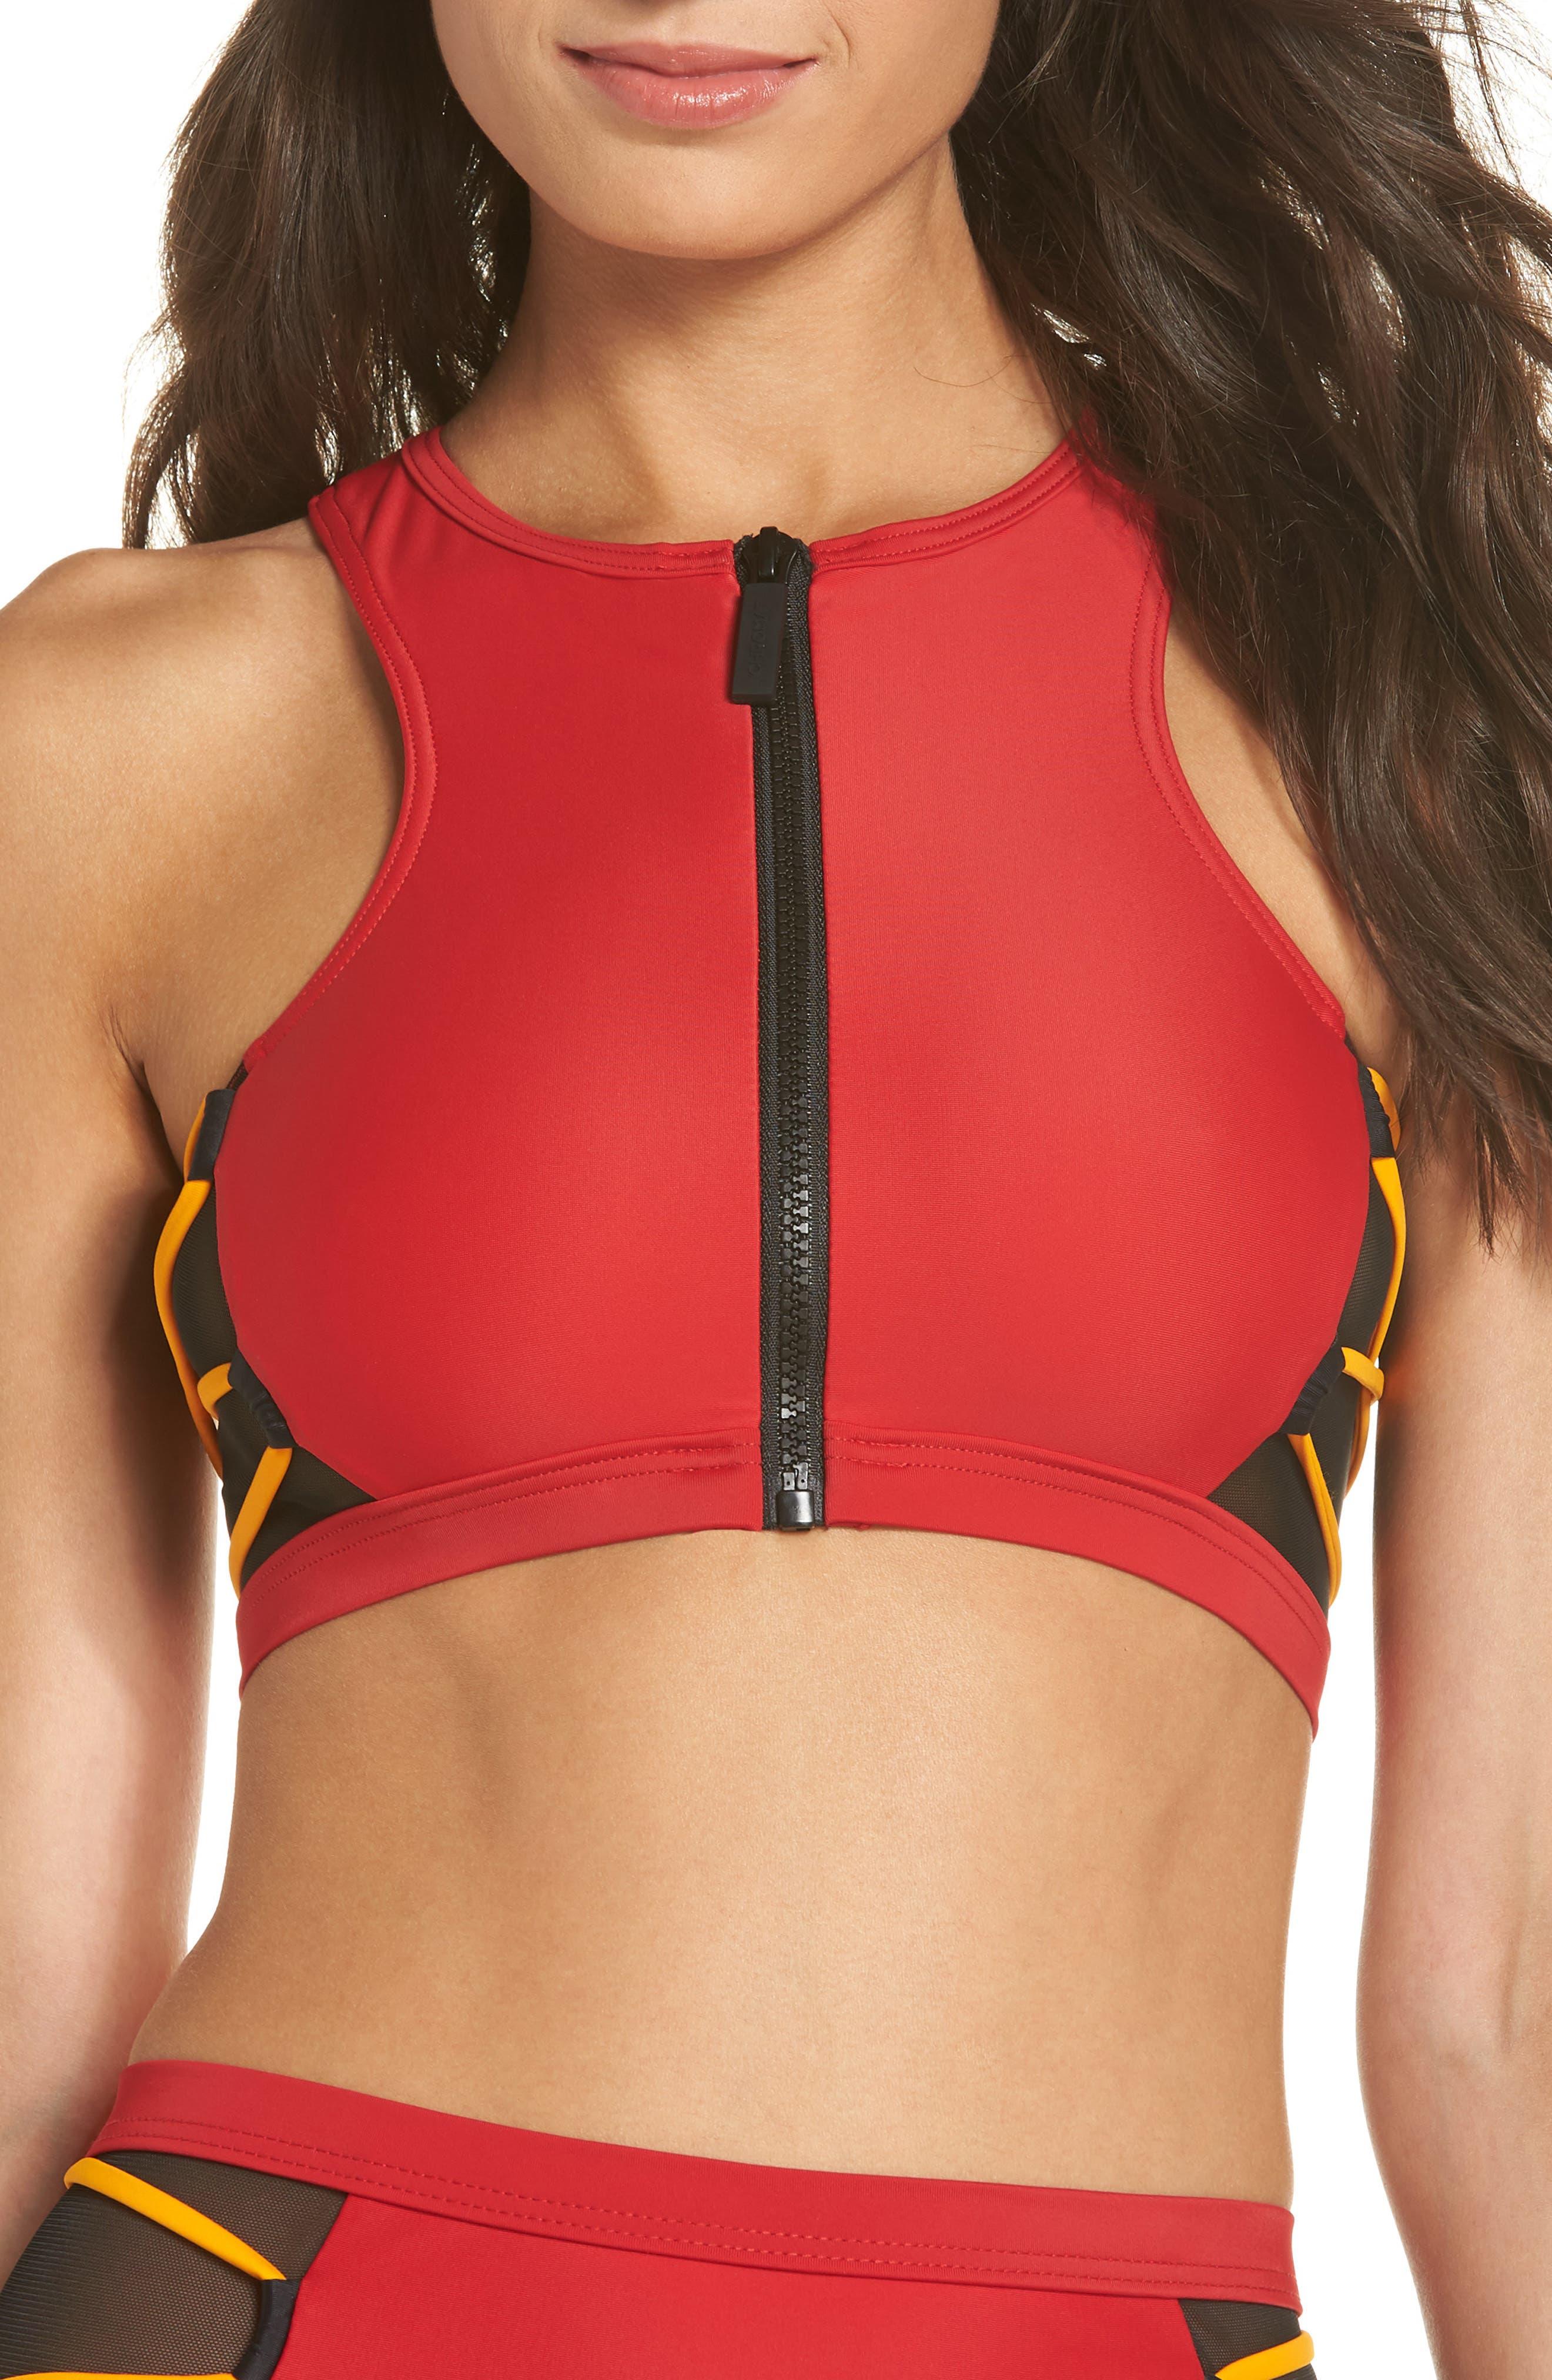 Launch Bikini Top,                             Main thumbnail 1, color,                             600